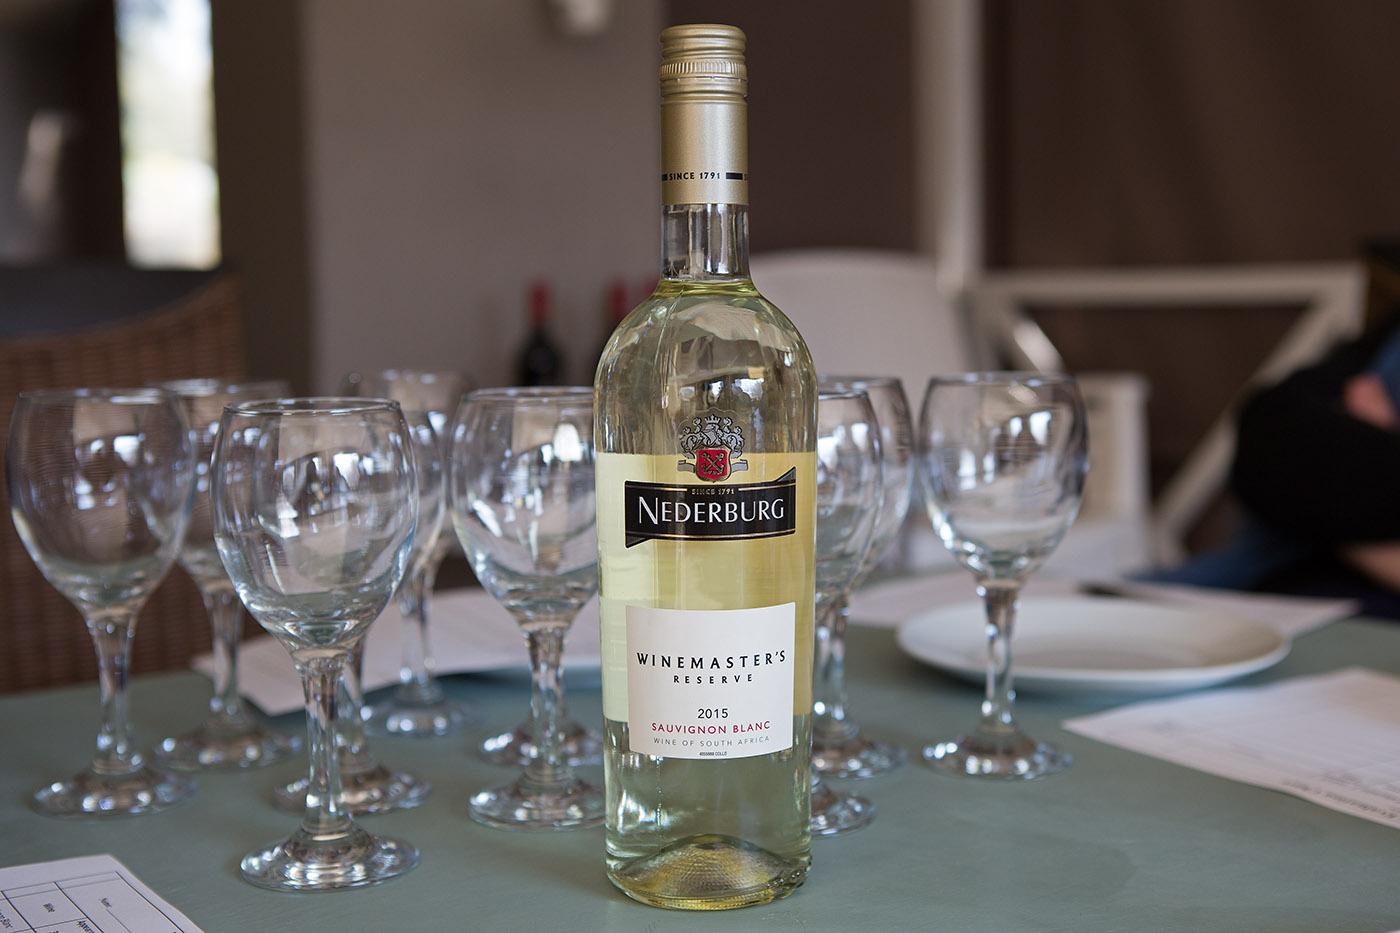 Nederburg Winemaster's Reserve Sauvignon Blanc 2015